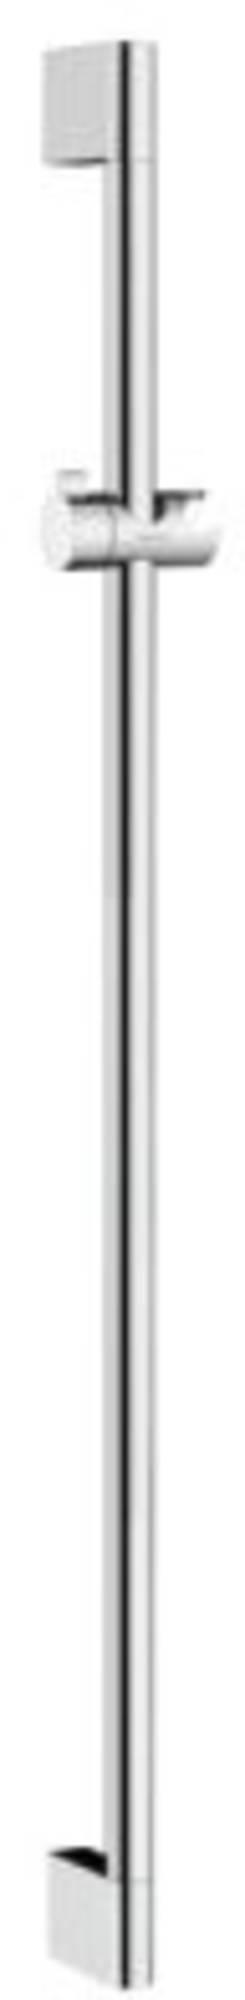 Hansgrohe Croma unica glijstang 90 cm. zonder doucheslang chroom